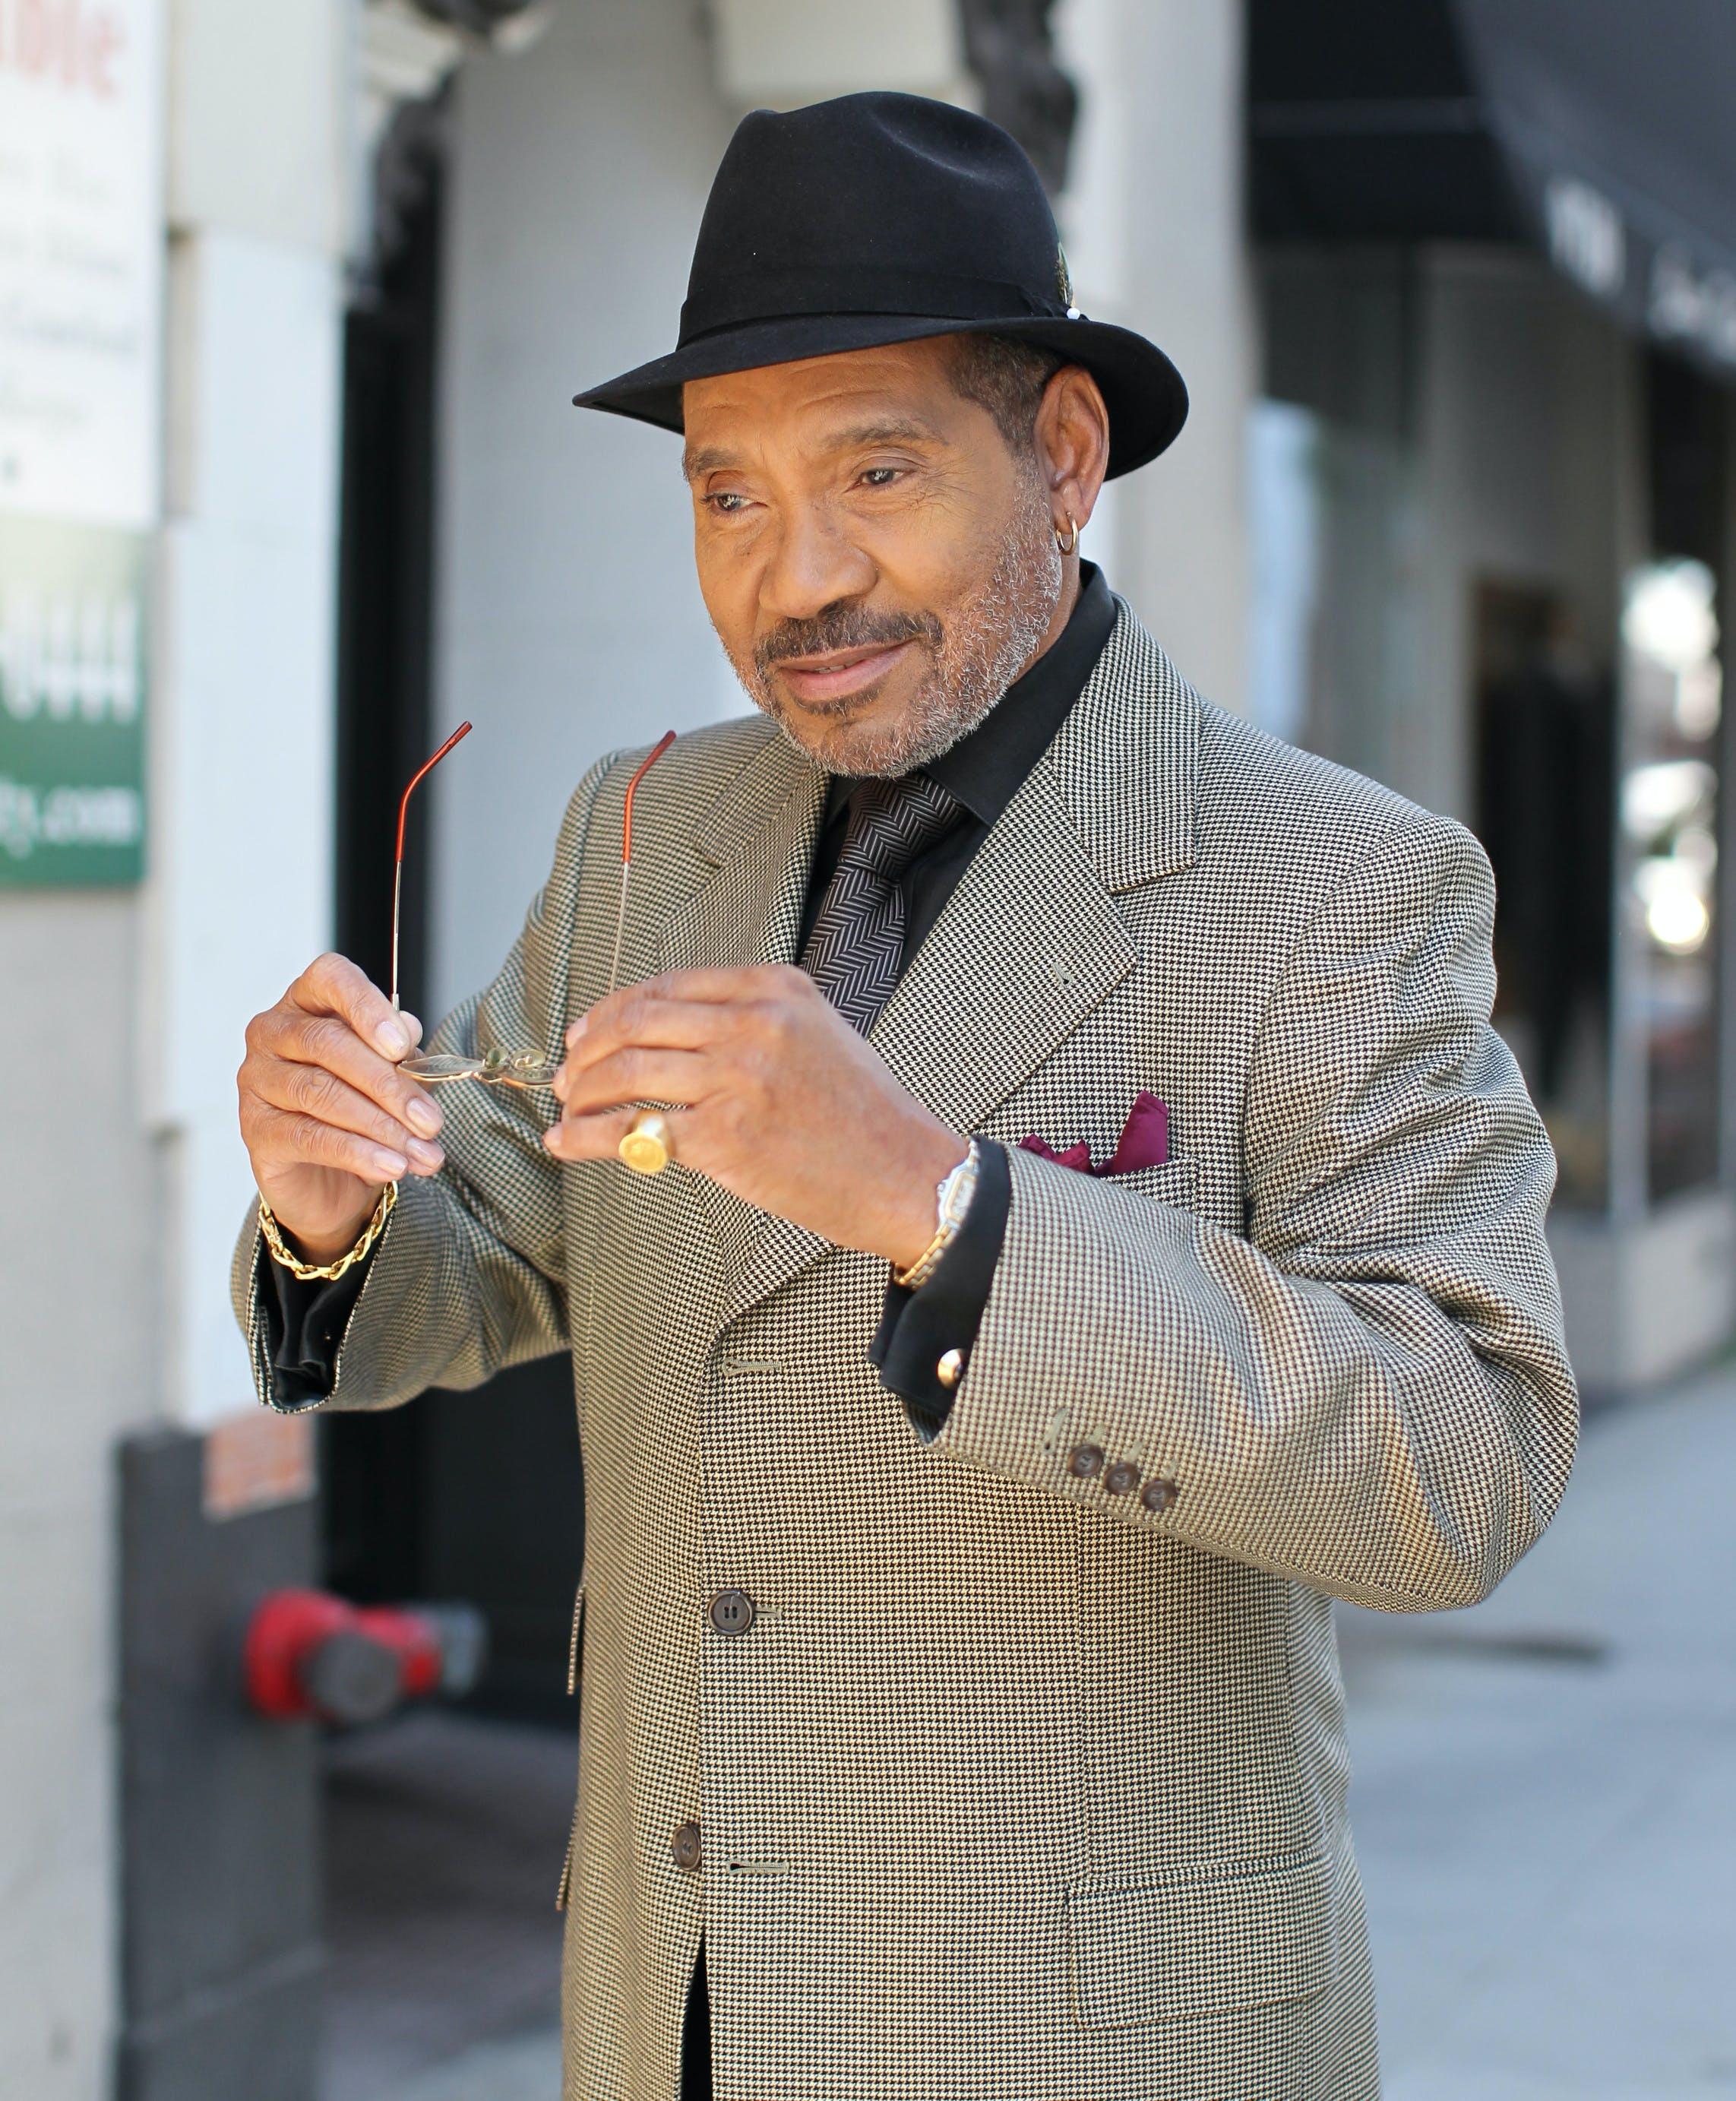 Photo of a Man Wearing Black Fedora Hat